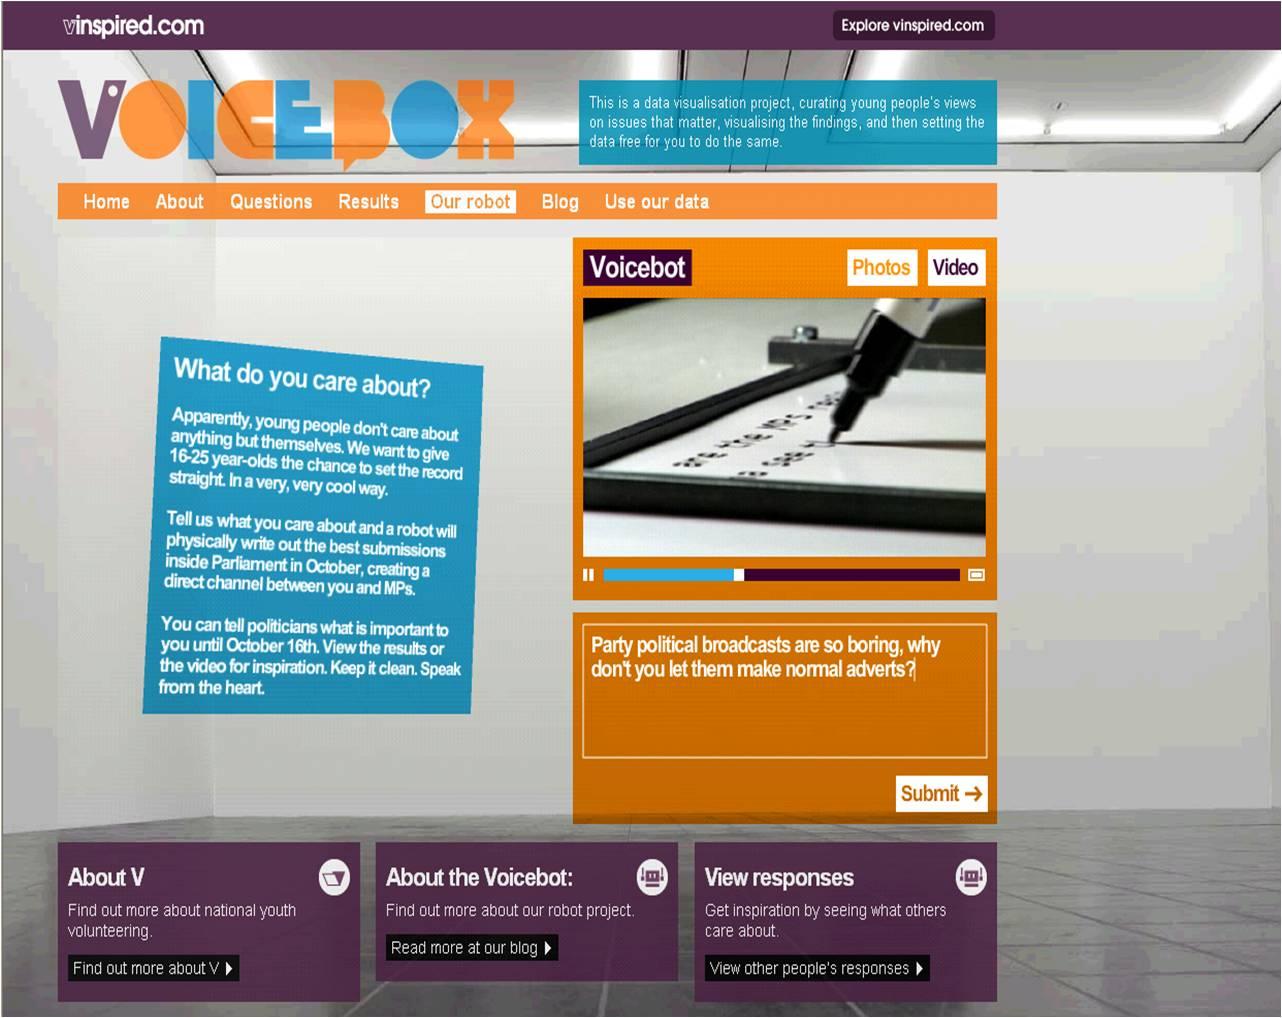 Voicebox vinspired.com